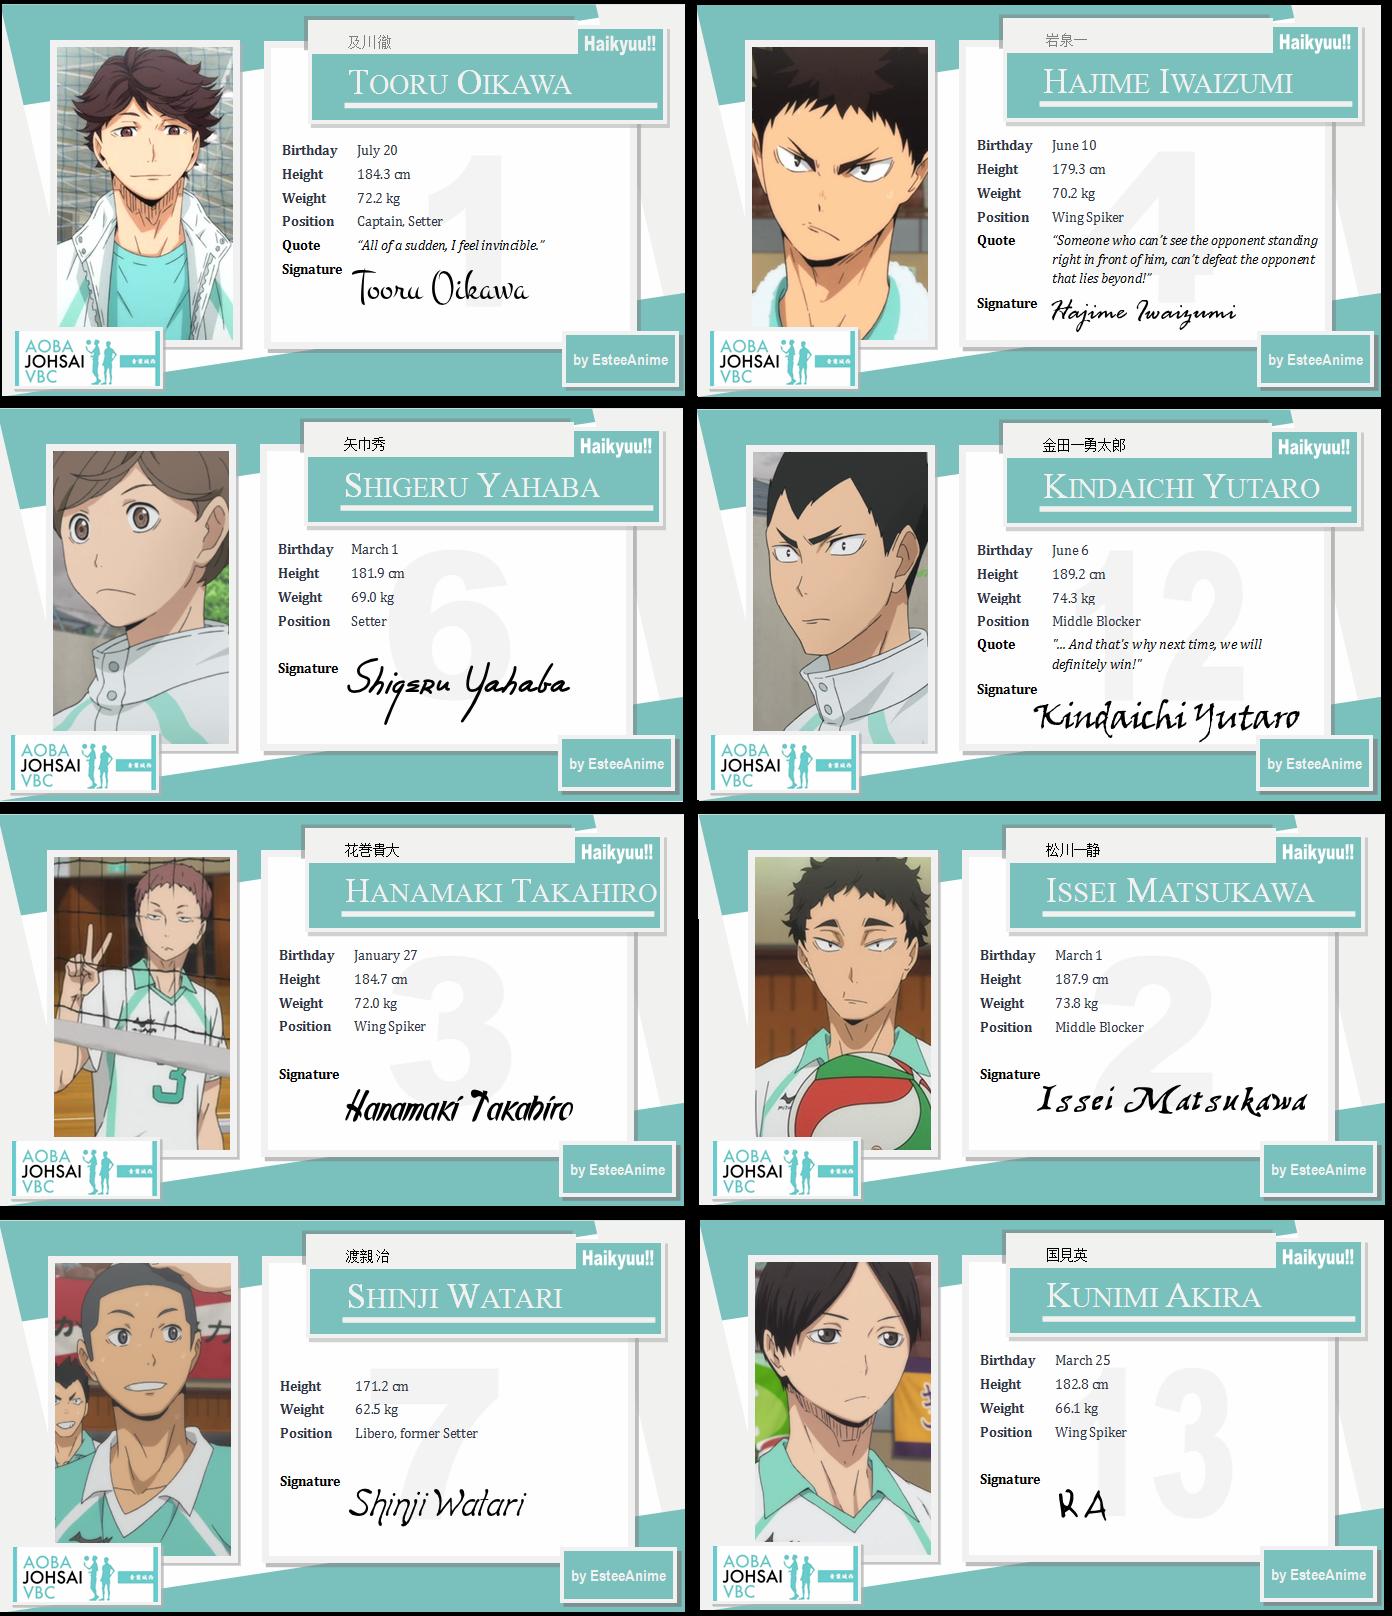 Haikyuu Character Cards Aoba Josai By Esteeso Haikyuu Haikyuu Characters Haikyuu Wallpaper